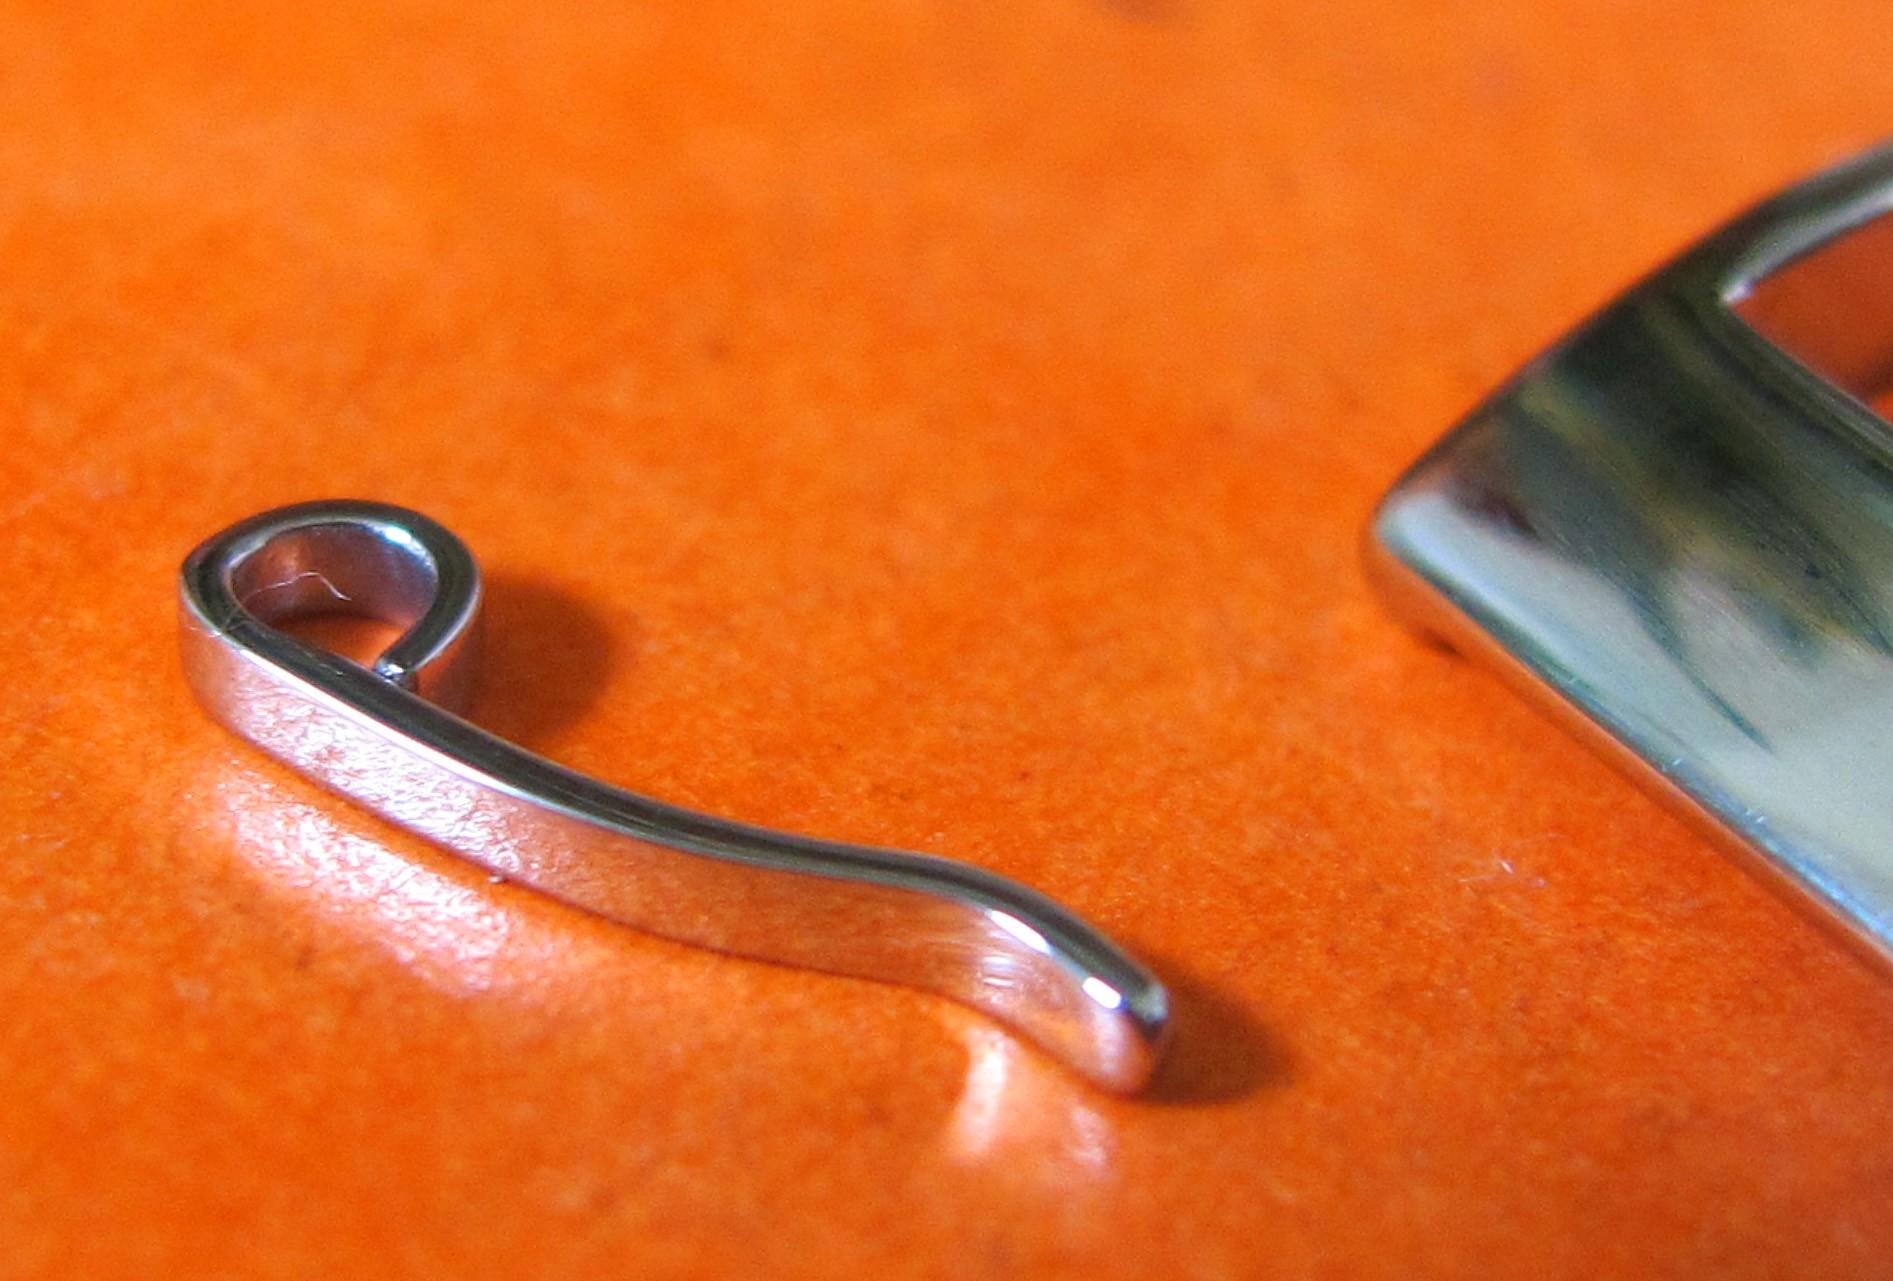 OMEGA BOUCLE ARDILLON 16mm ACIER INOX BRACELET